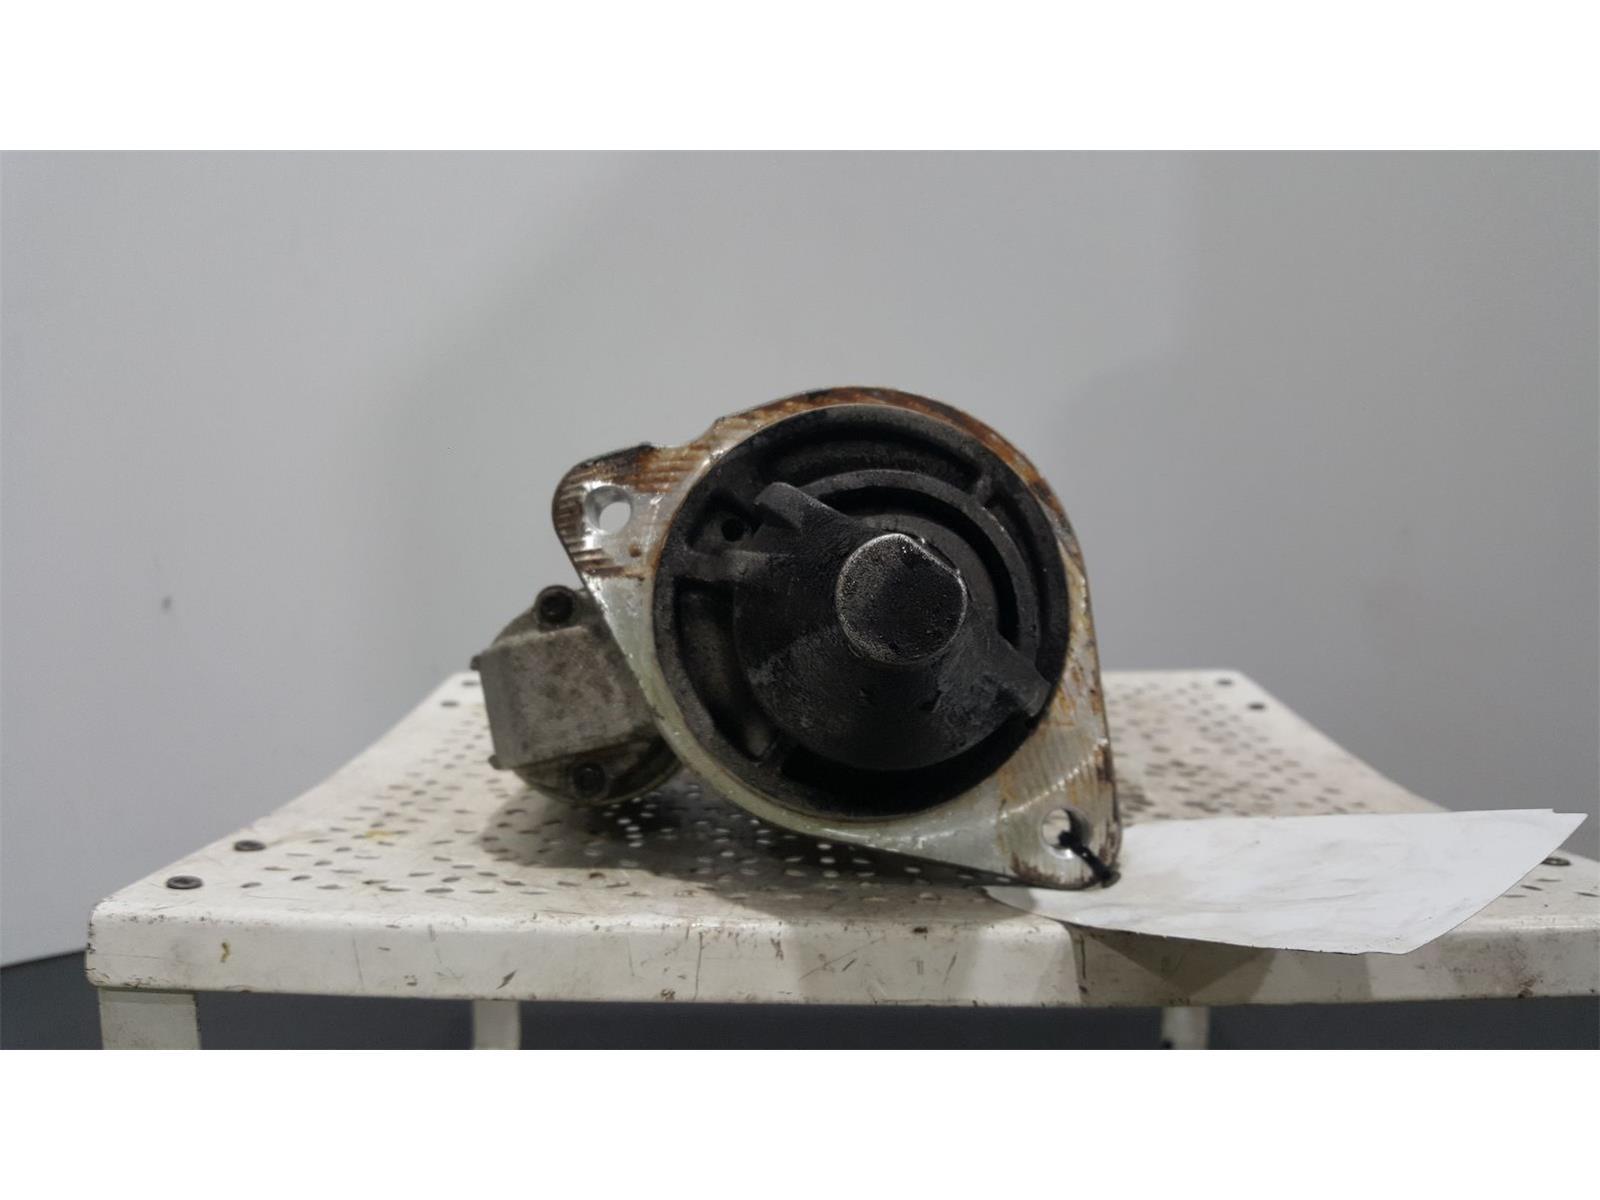 FORD FIESTA ZETEC MK7 FL (B299) 2008 TO 2017 - 1.0 PETROL Starter Motor